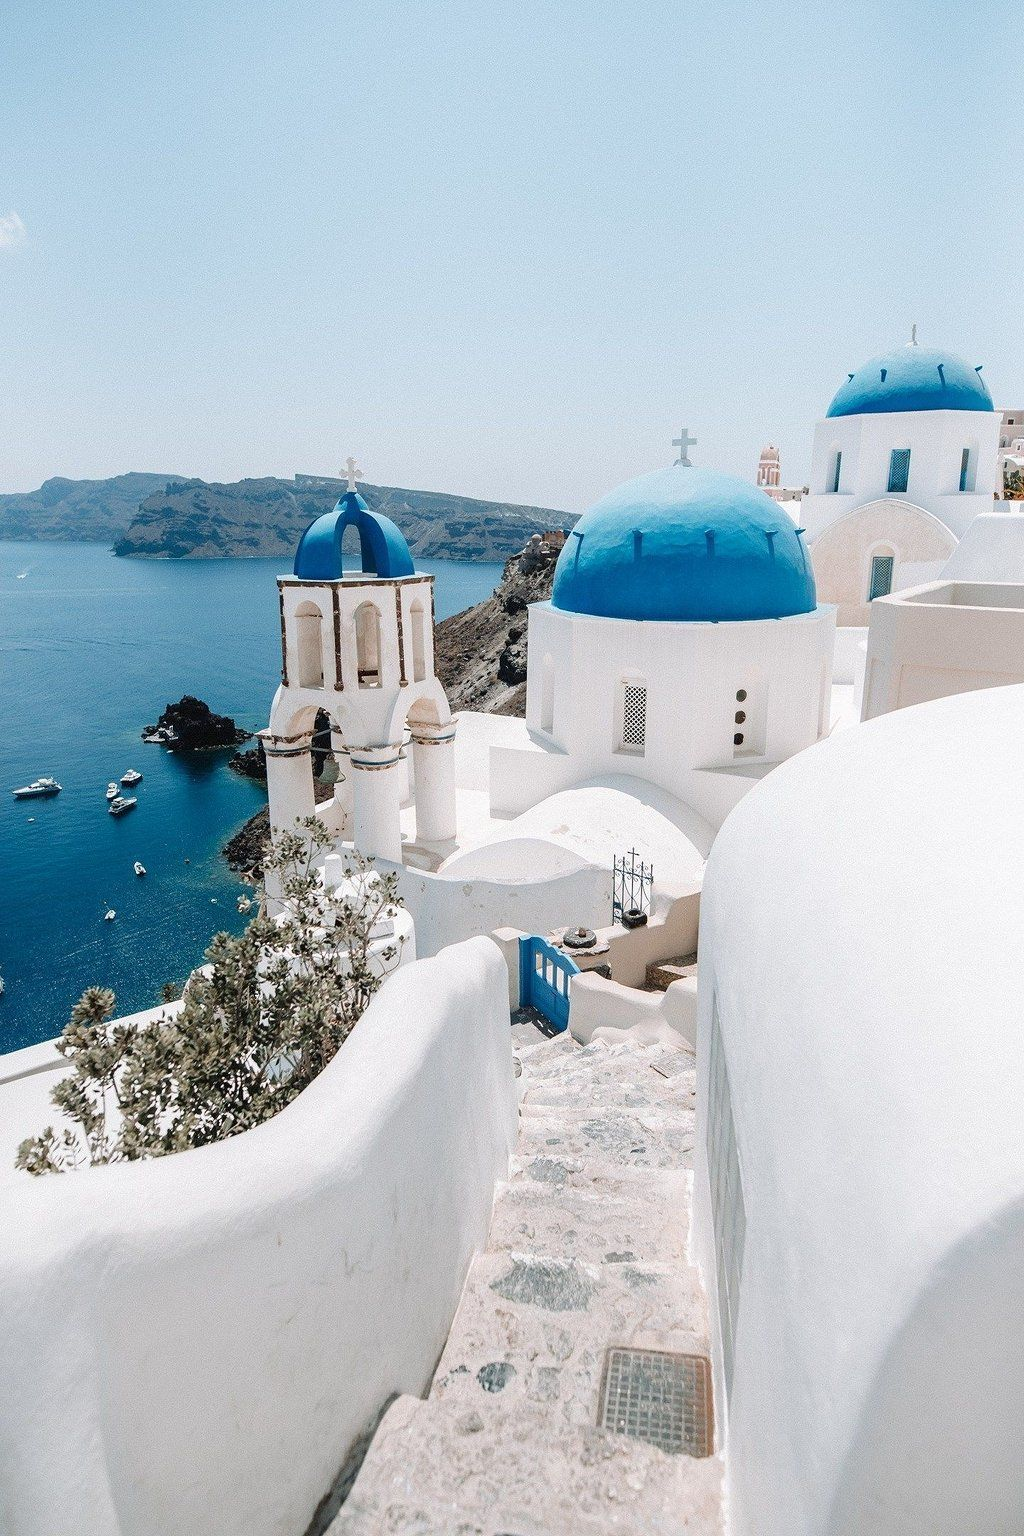 Organic Travel Tips Long Flights #Travelgram #TravelUnitedStates